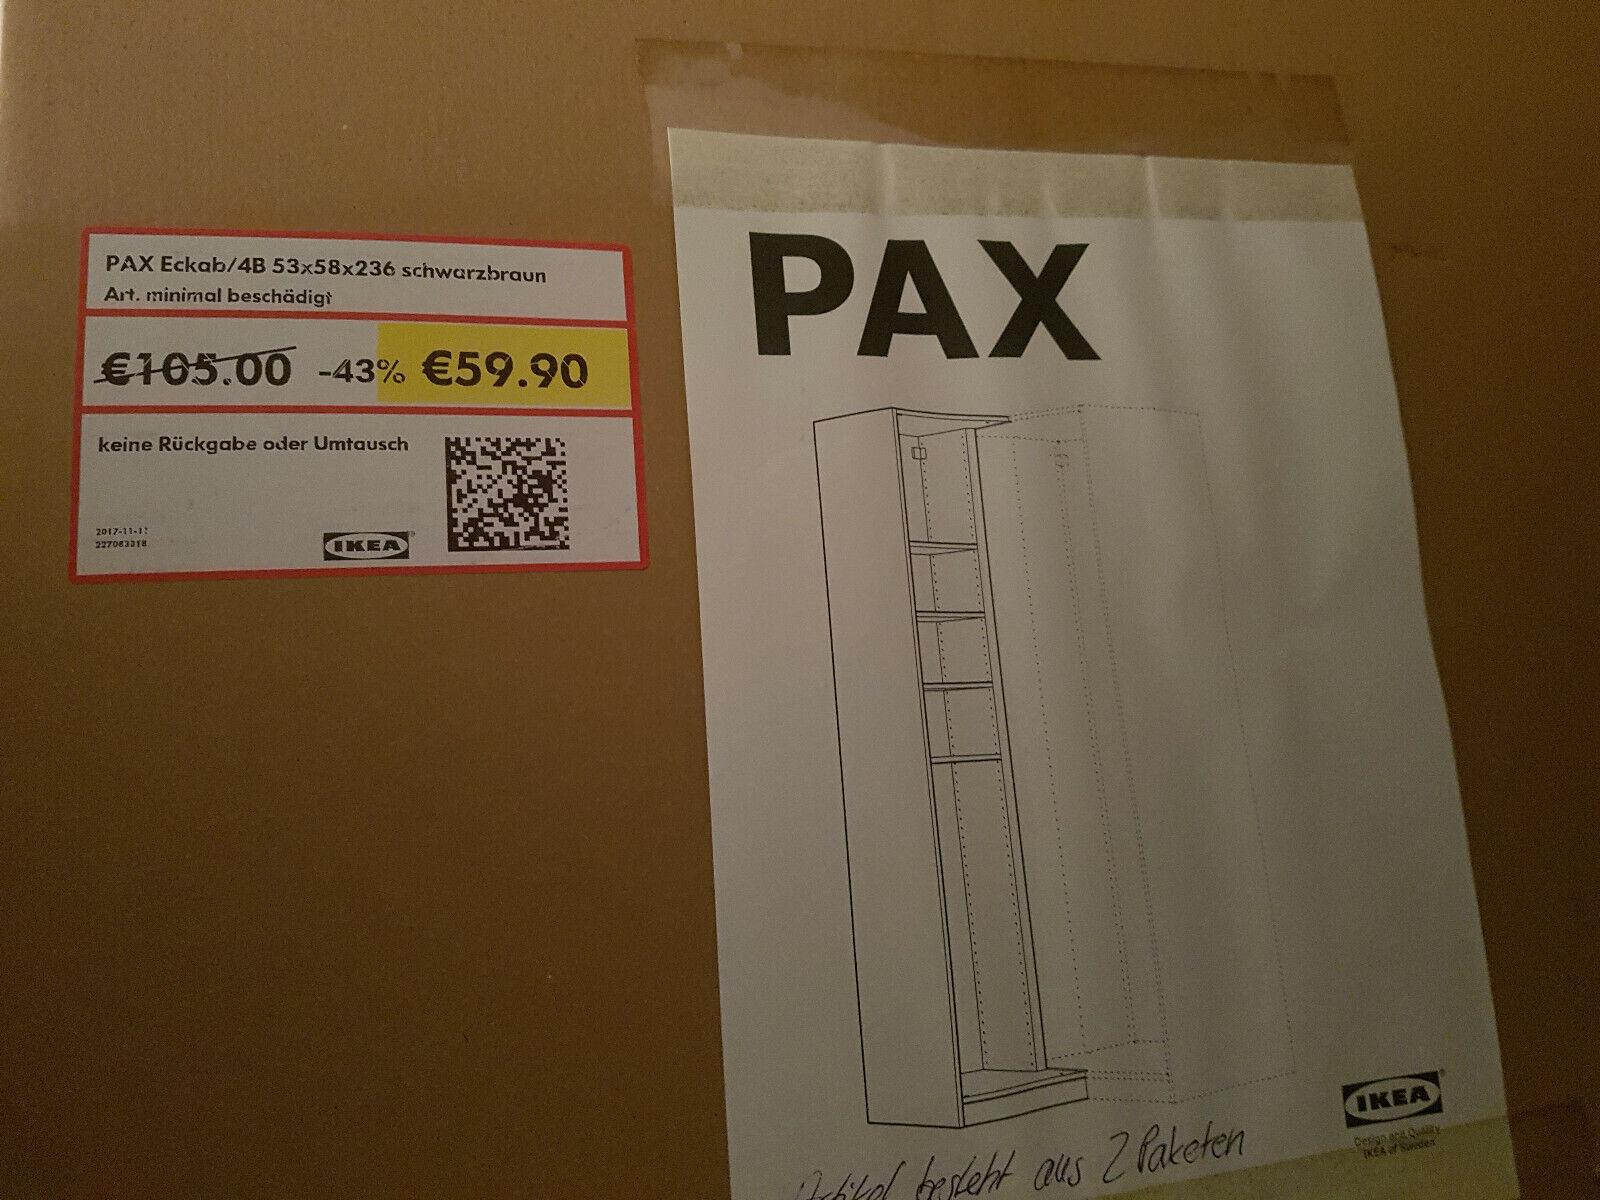 Pax Ikea Eckab Schwarzbraun Mobel